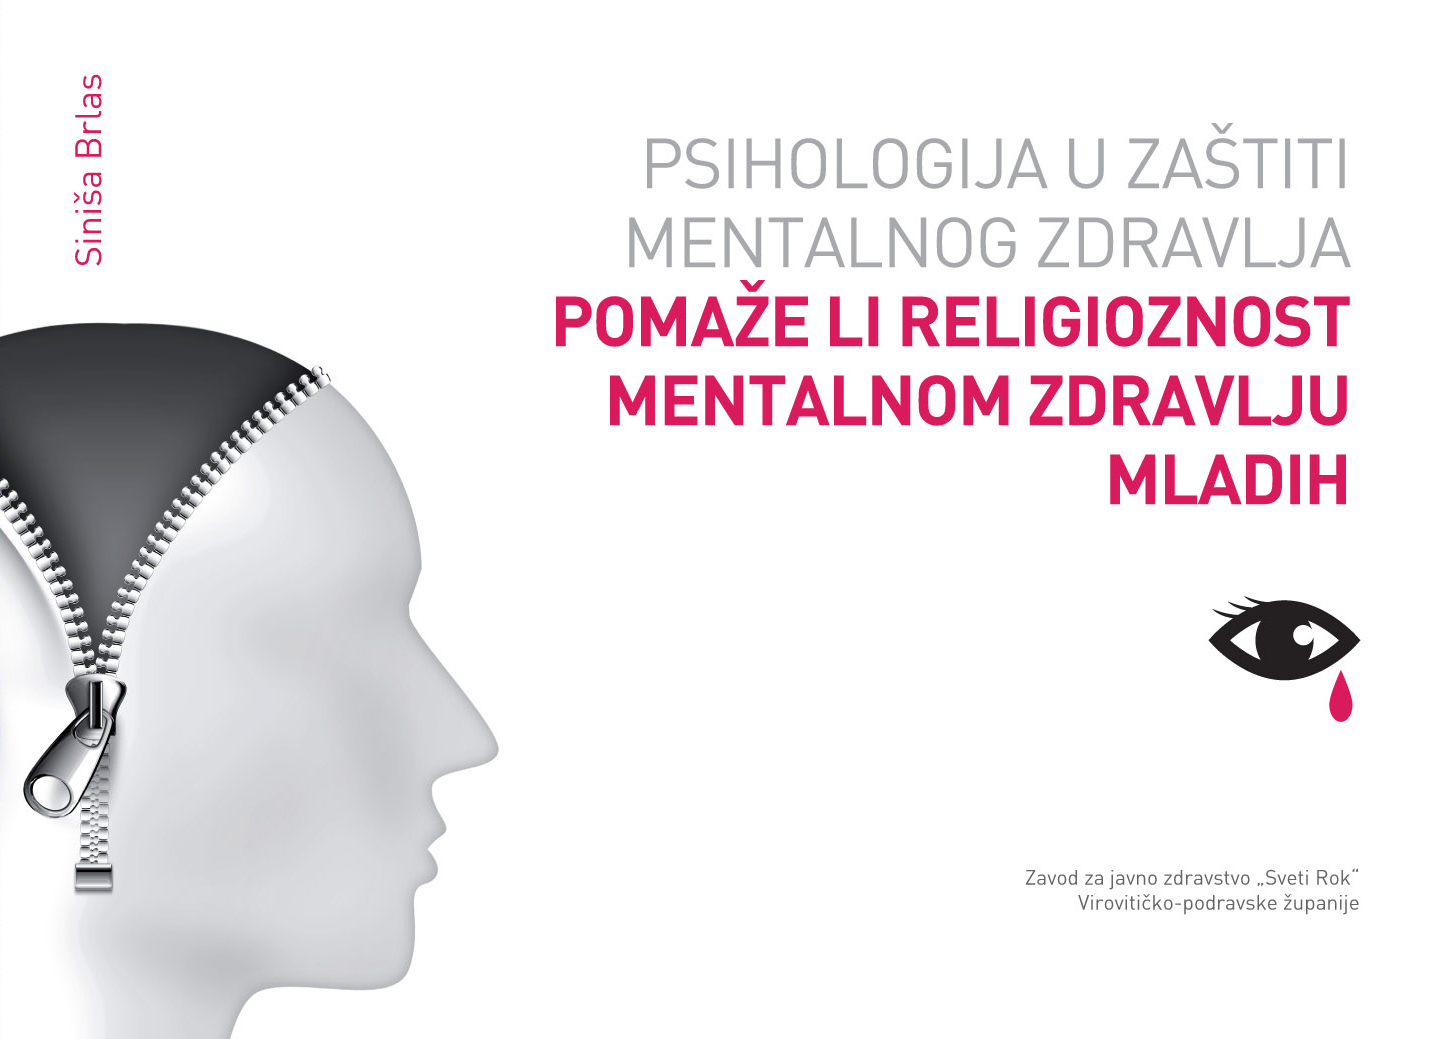 psihologija-u-zastiti-mentalnog-zdravlja-cover-2_